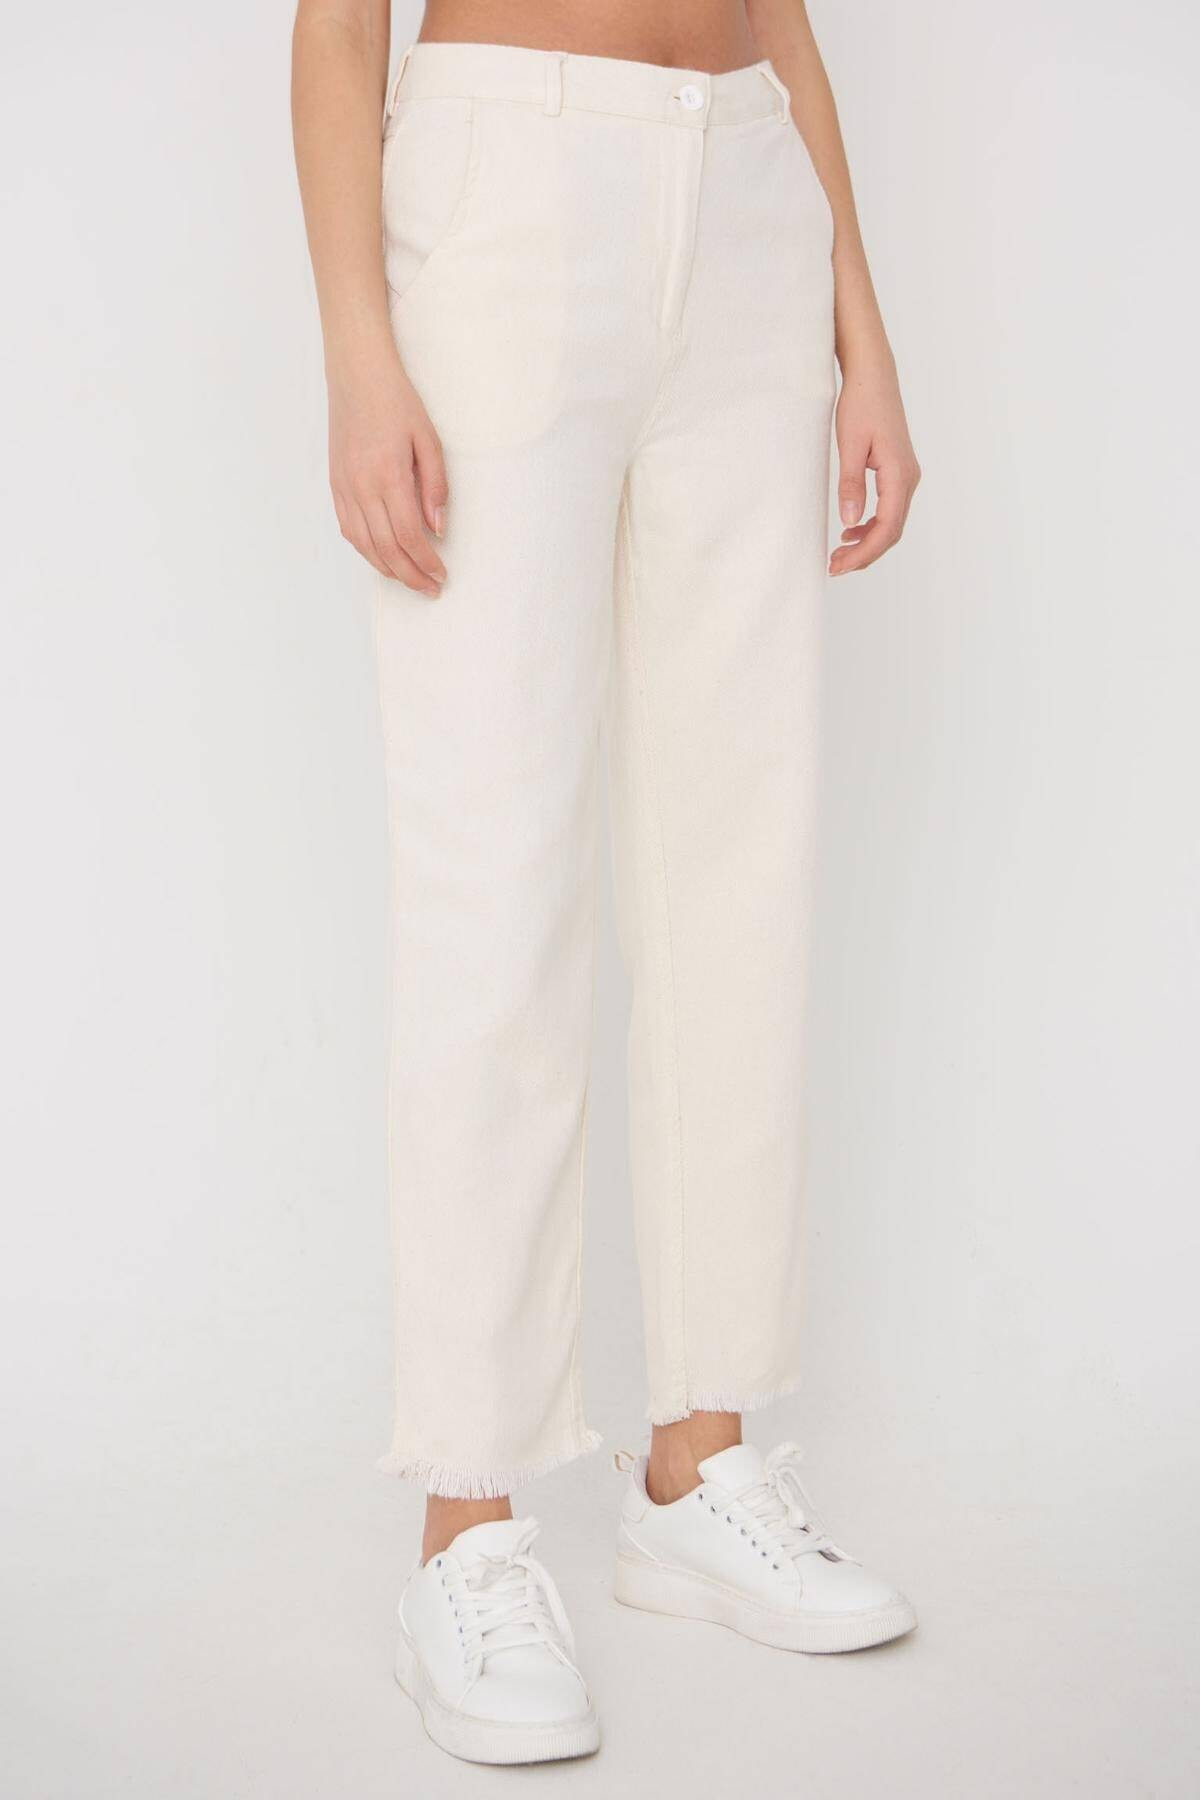 Addax Kadın Ham Paça Detaylı Pantolon Pn11-0049 - K8 Adx-0000023876